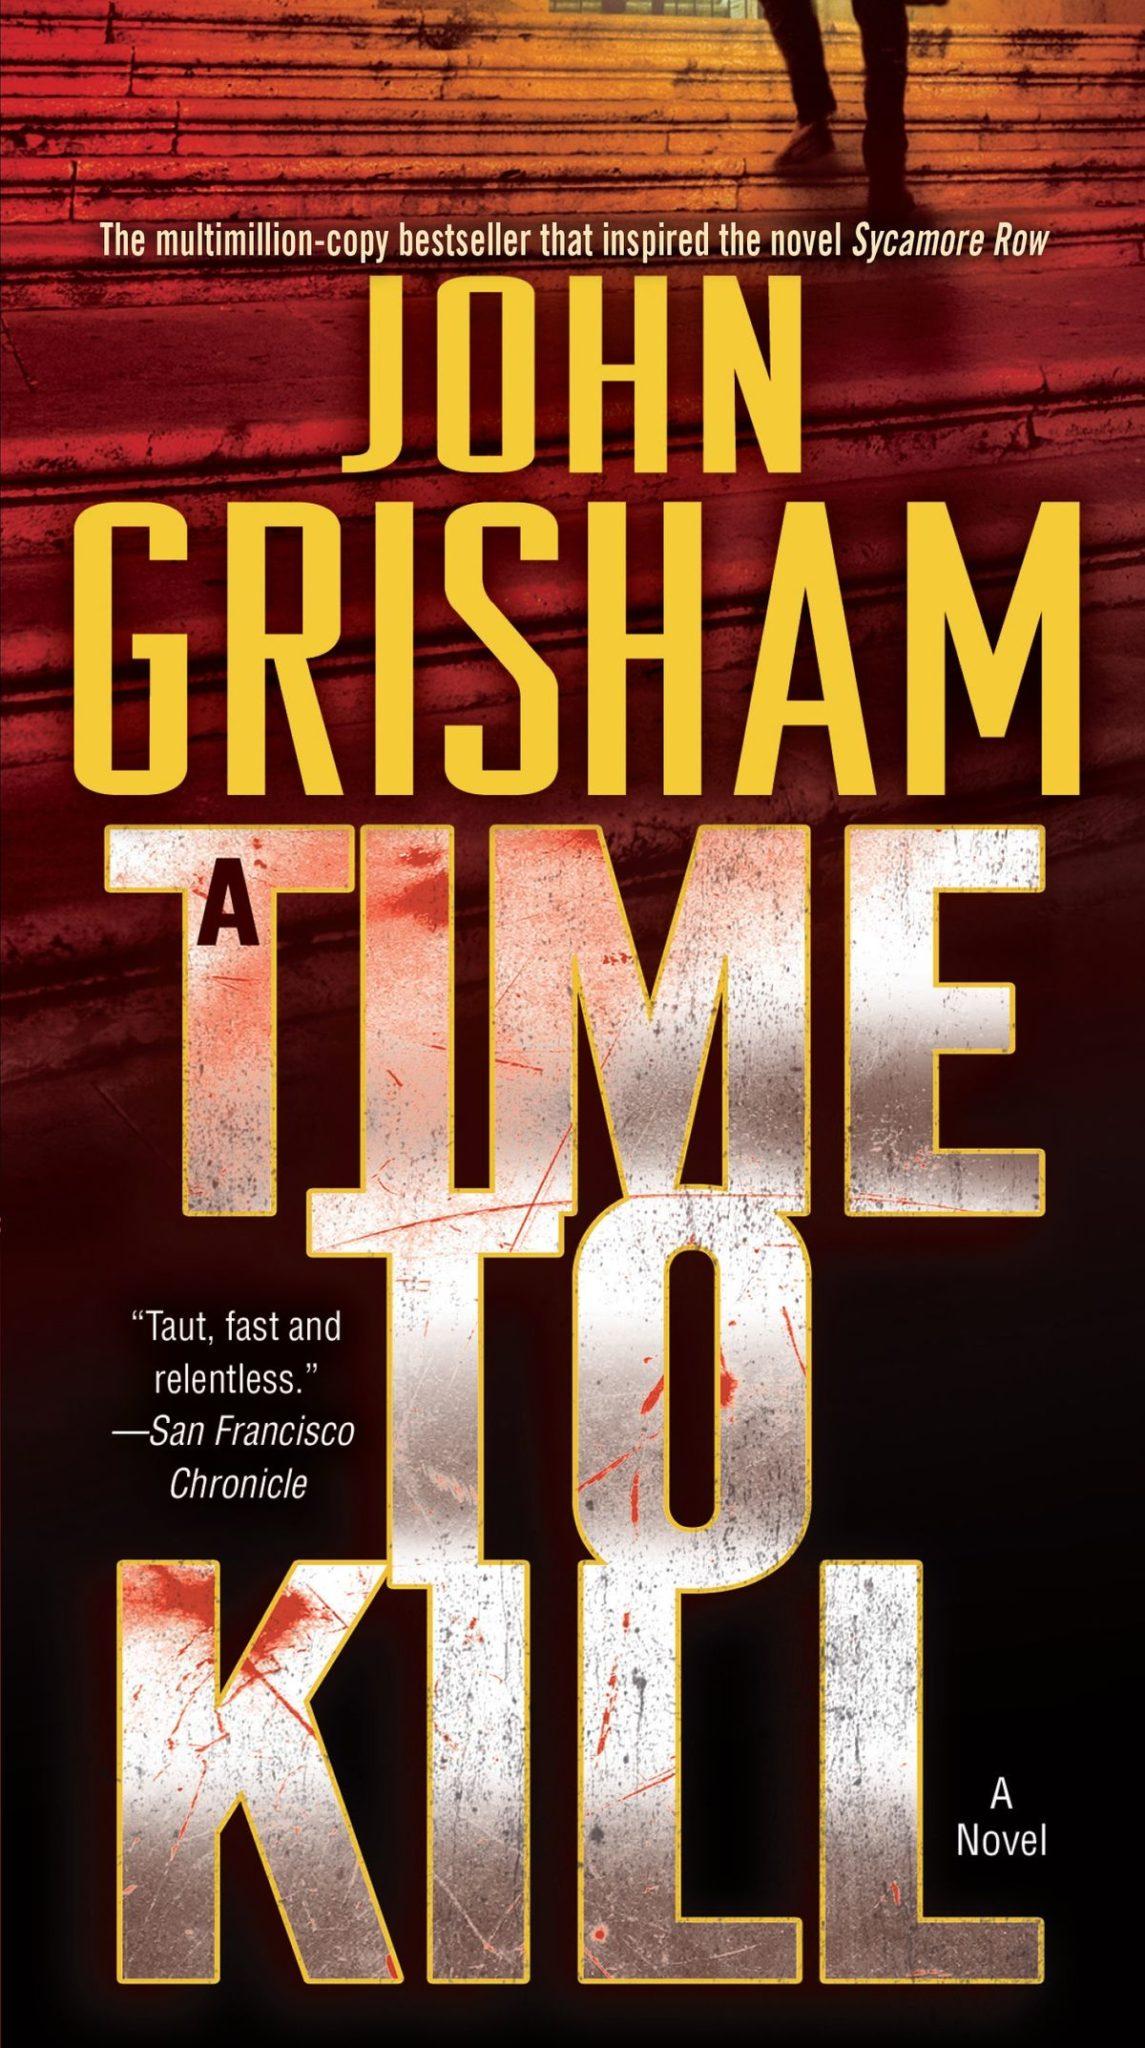 John Grisham books 2